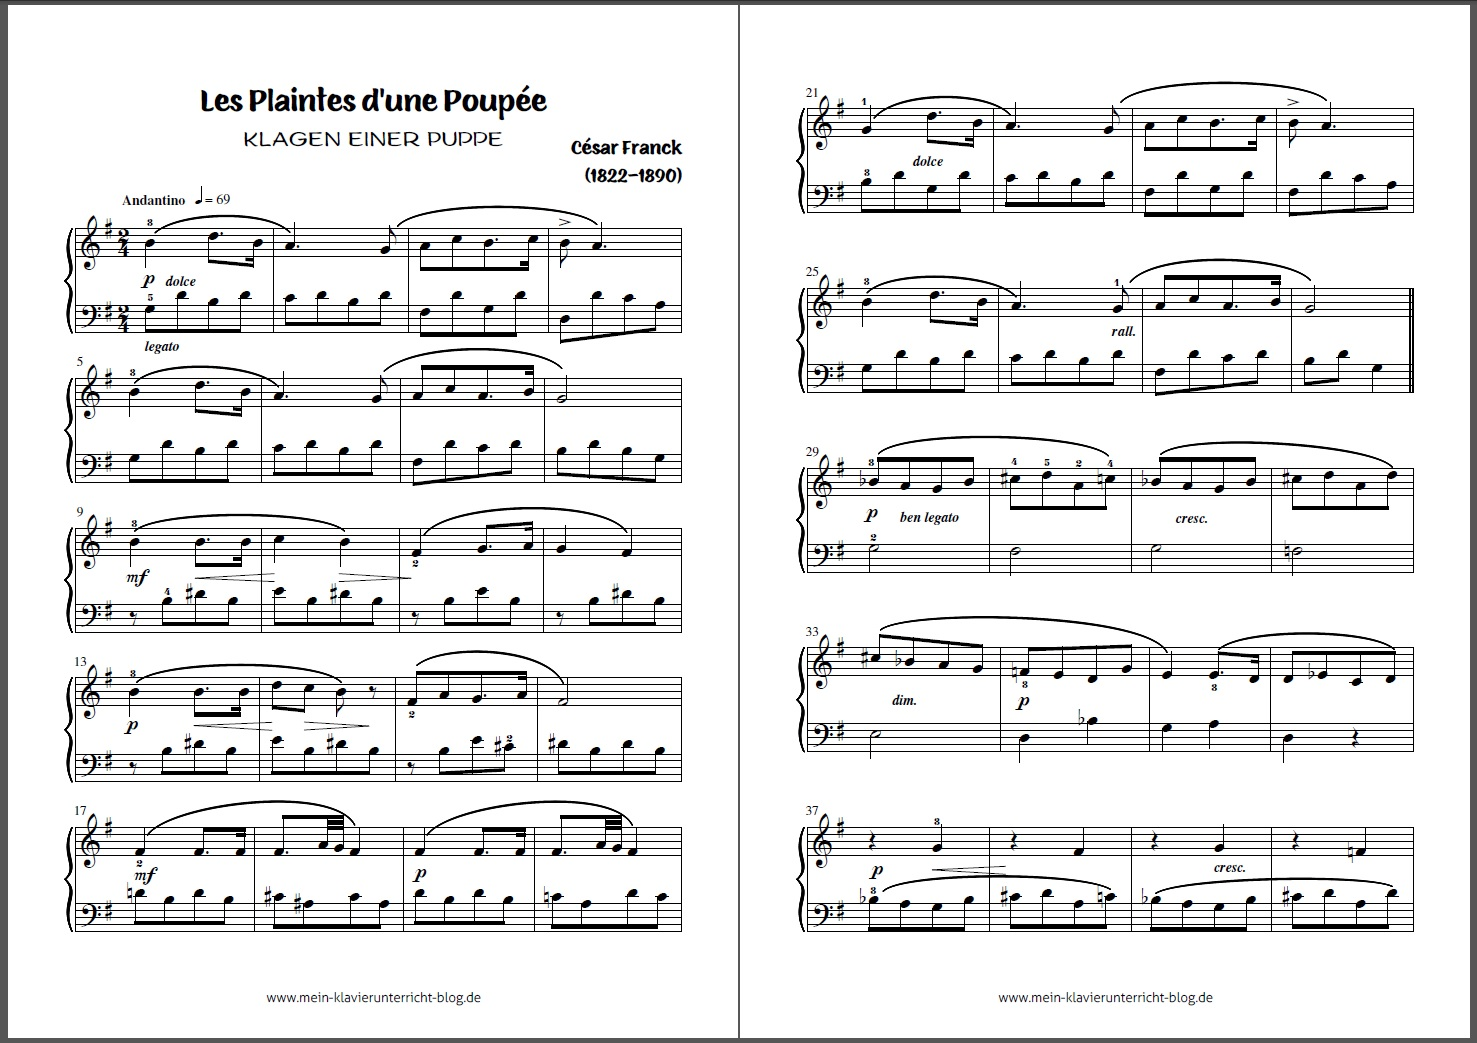 César Franck Franck - L'Orchestre De La Suisse Romande - Sinfonía - El Cazador Maldito